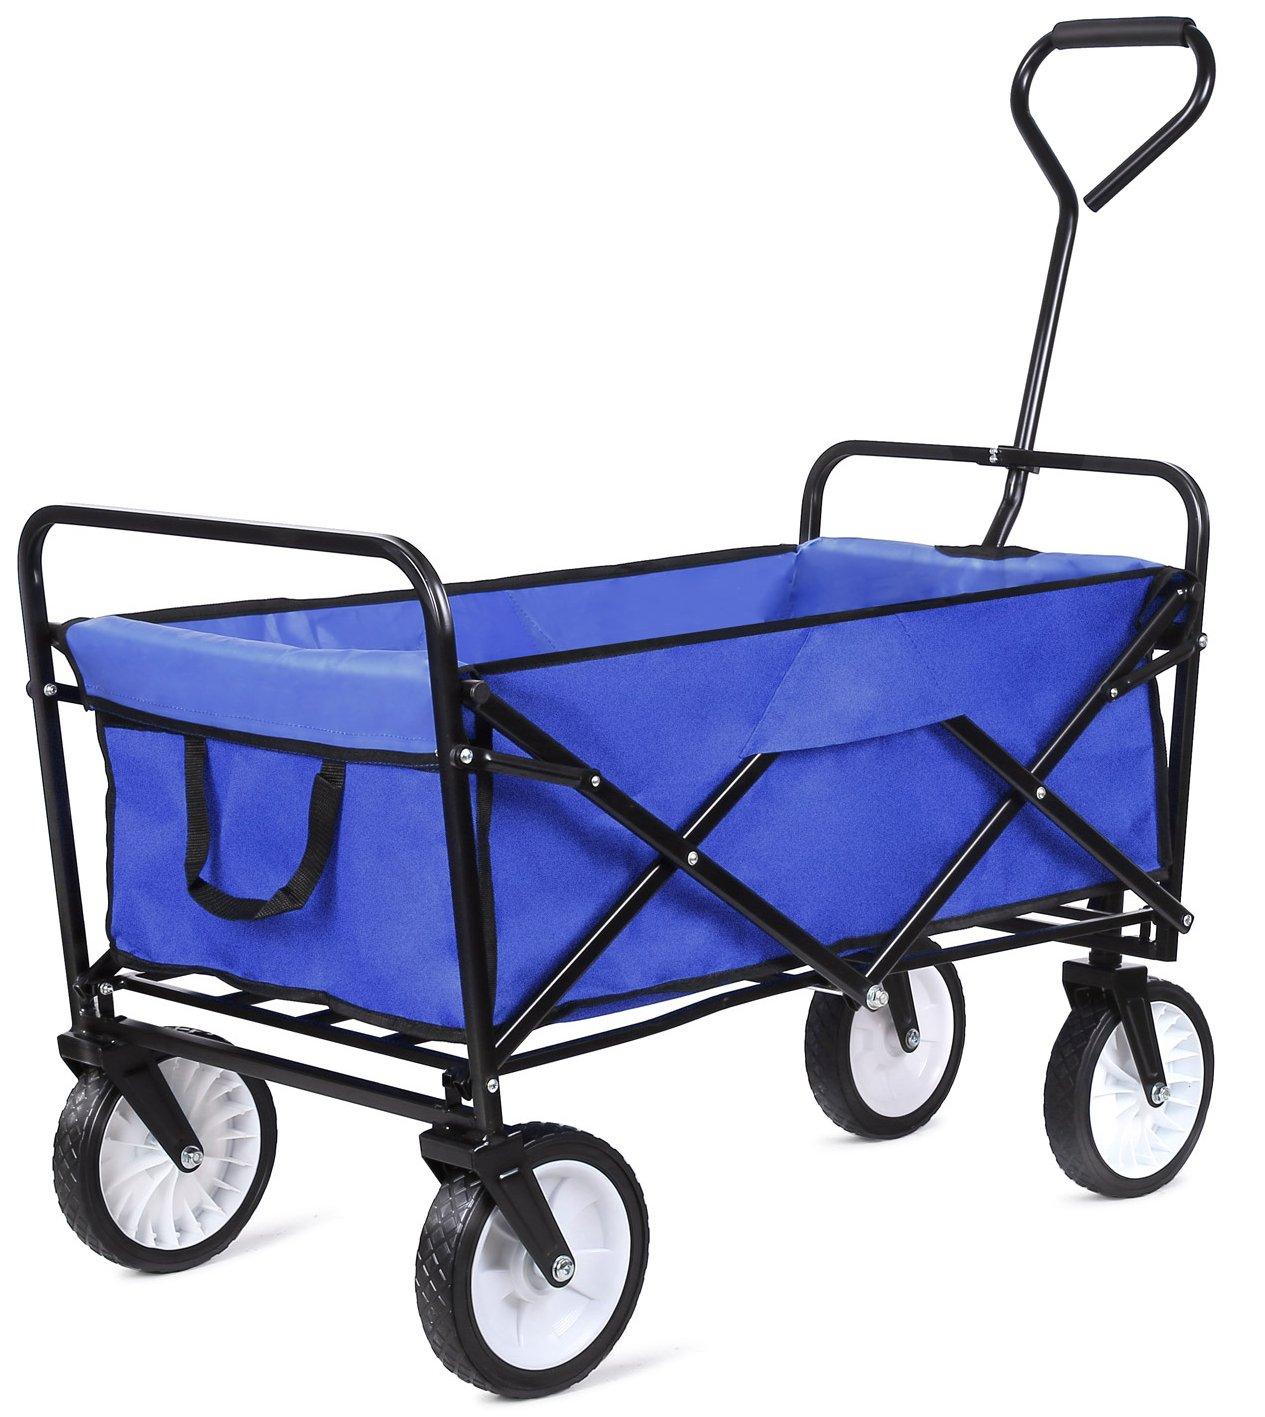 femor Collapsible Folding Outdoor Utility Wagon, Heavy Duty Garden Cart for Shopping Beach Outdoors (Blue)